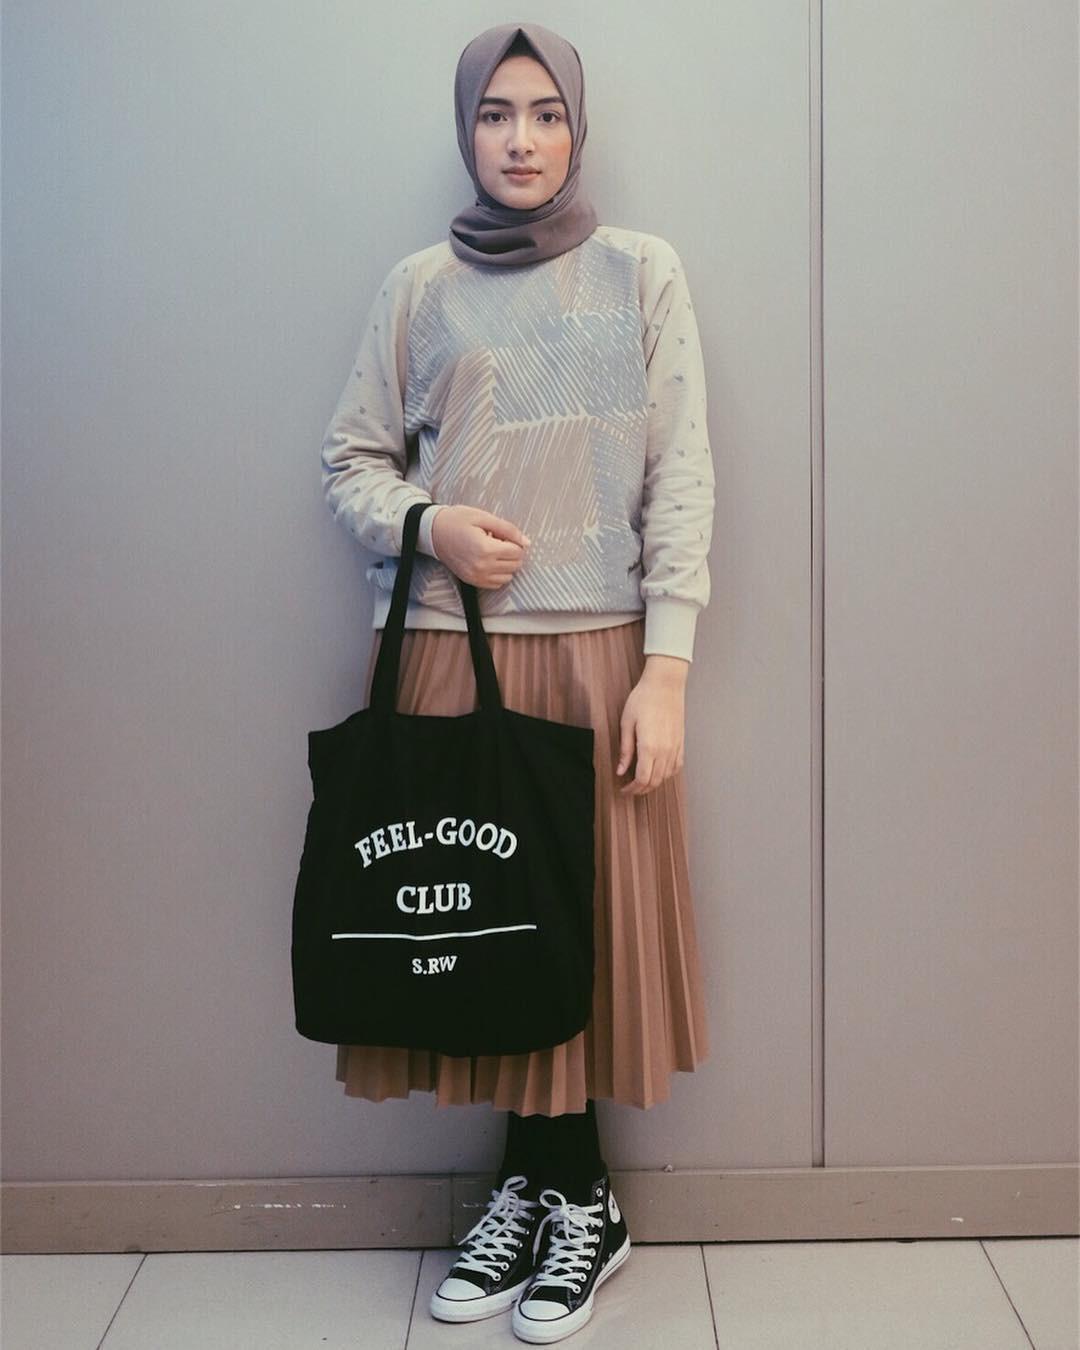 Pakai sweater kemudian padu padankan dengan pleats skirt dan pilih sneakers, hijab kamu makin trendi. (sumber foto: @bellattamimi/instagram)